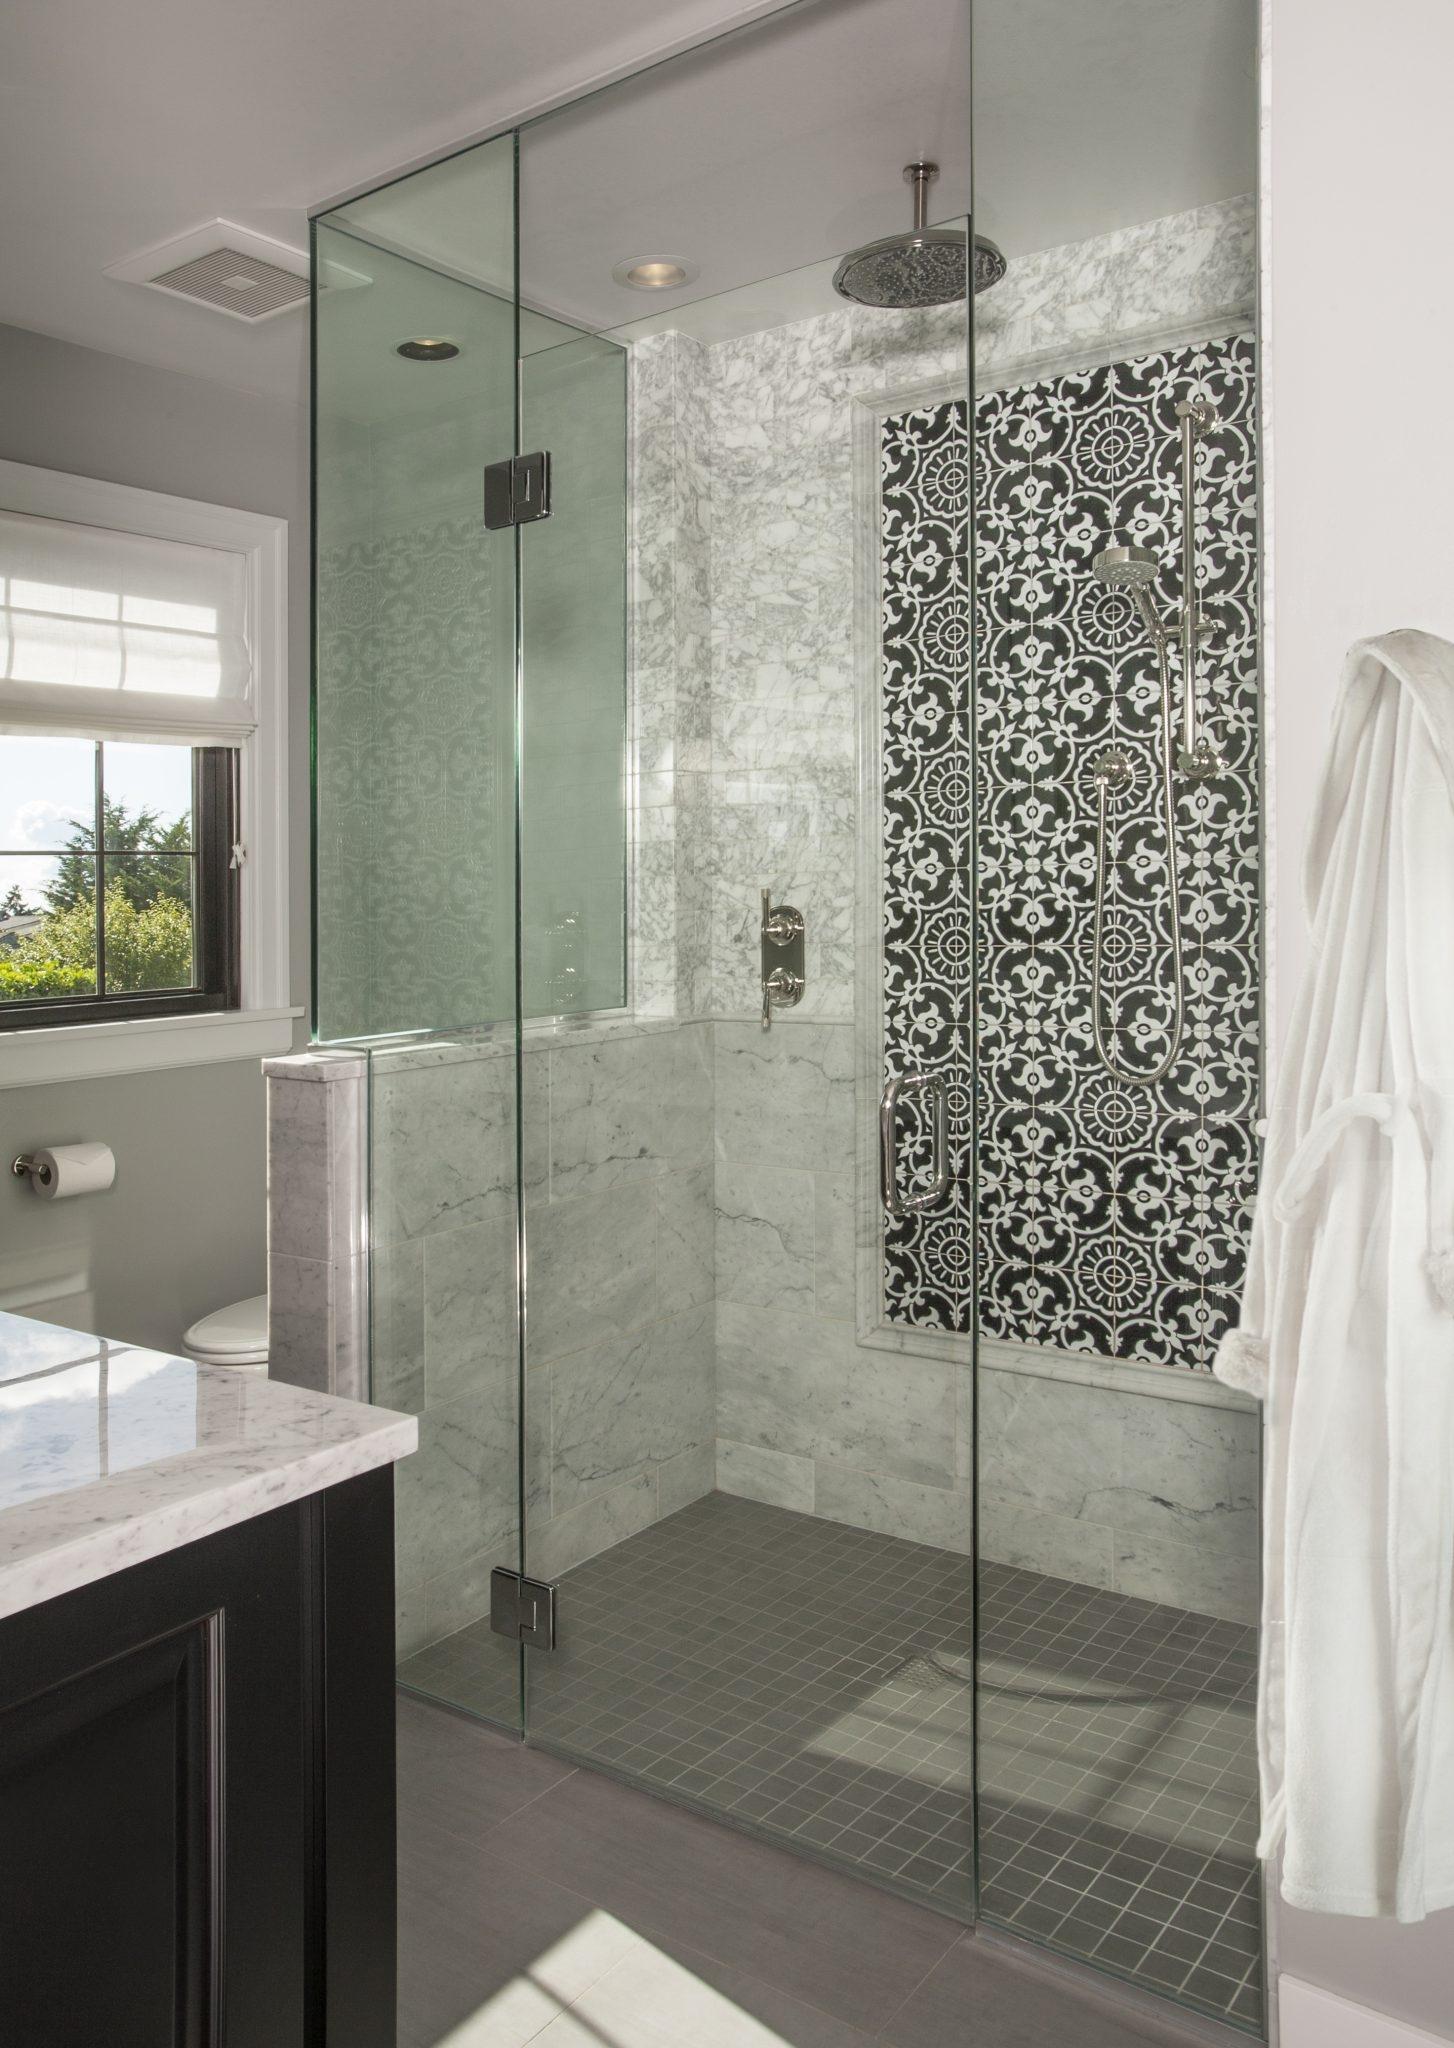 bathroom tiles designs ideas for small